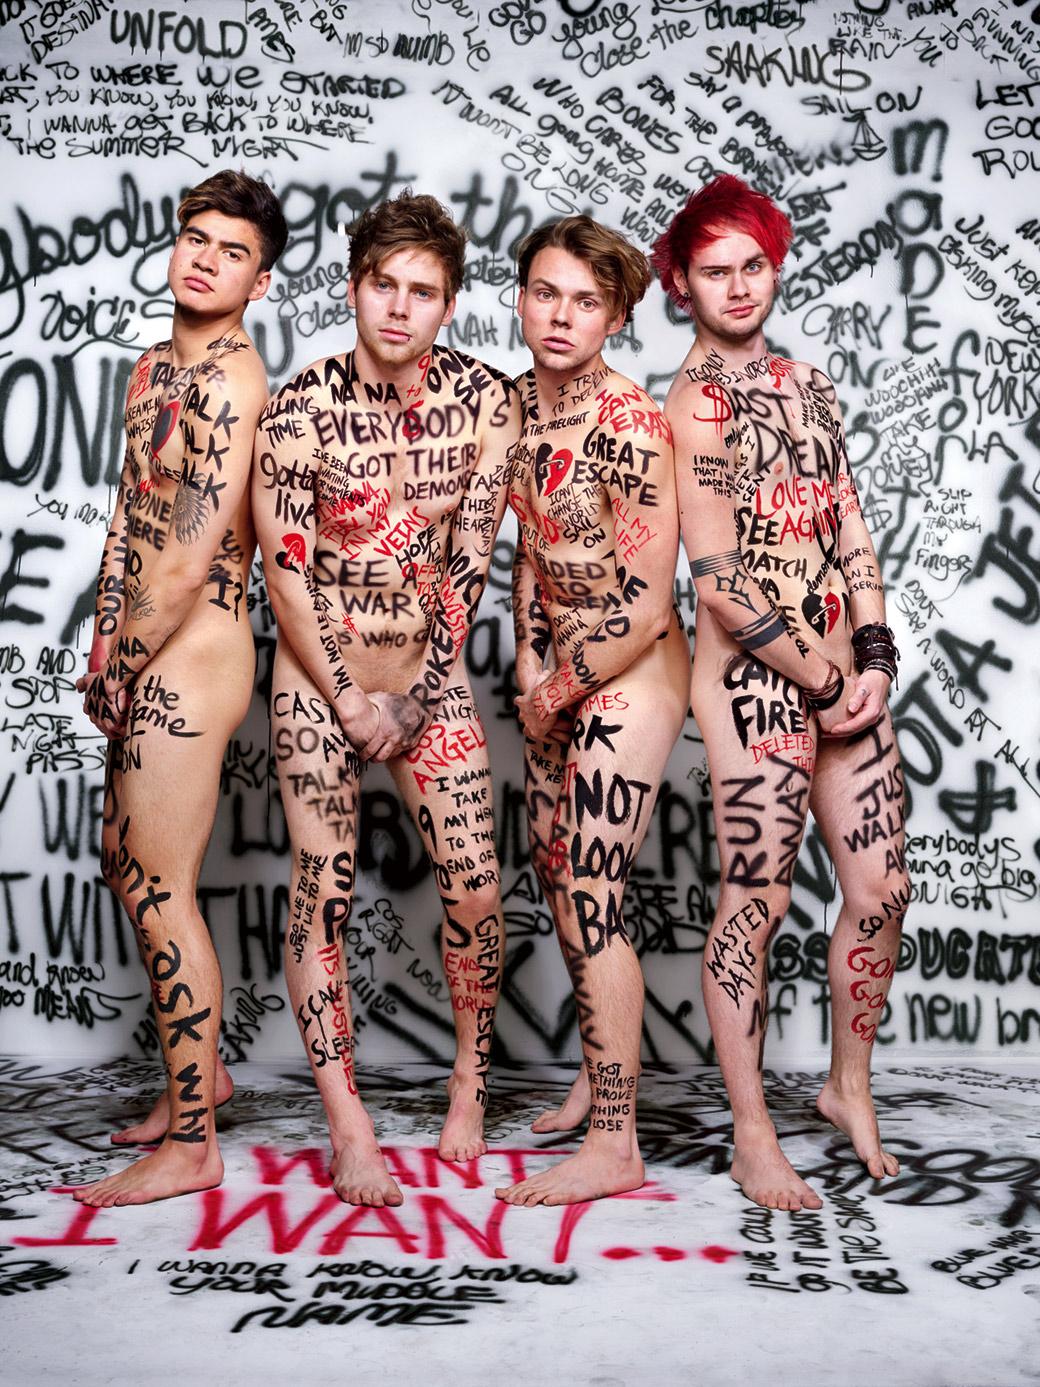 I 5SOS sono Luke Hemmings, Michael Clifford, Calum Hood e Ashton Irwin - Foto Martin Schoeller per Rolling Stone